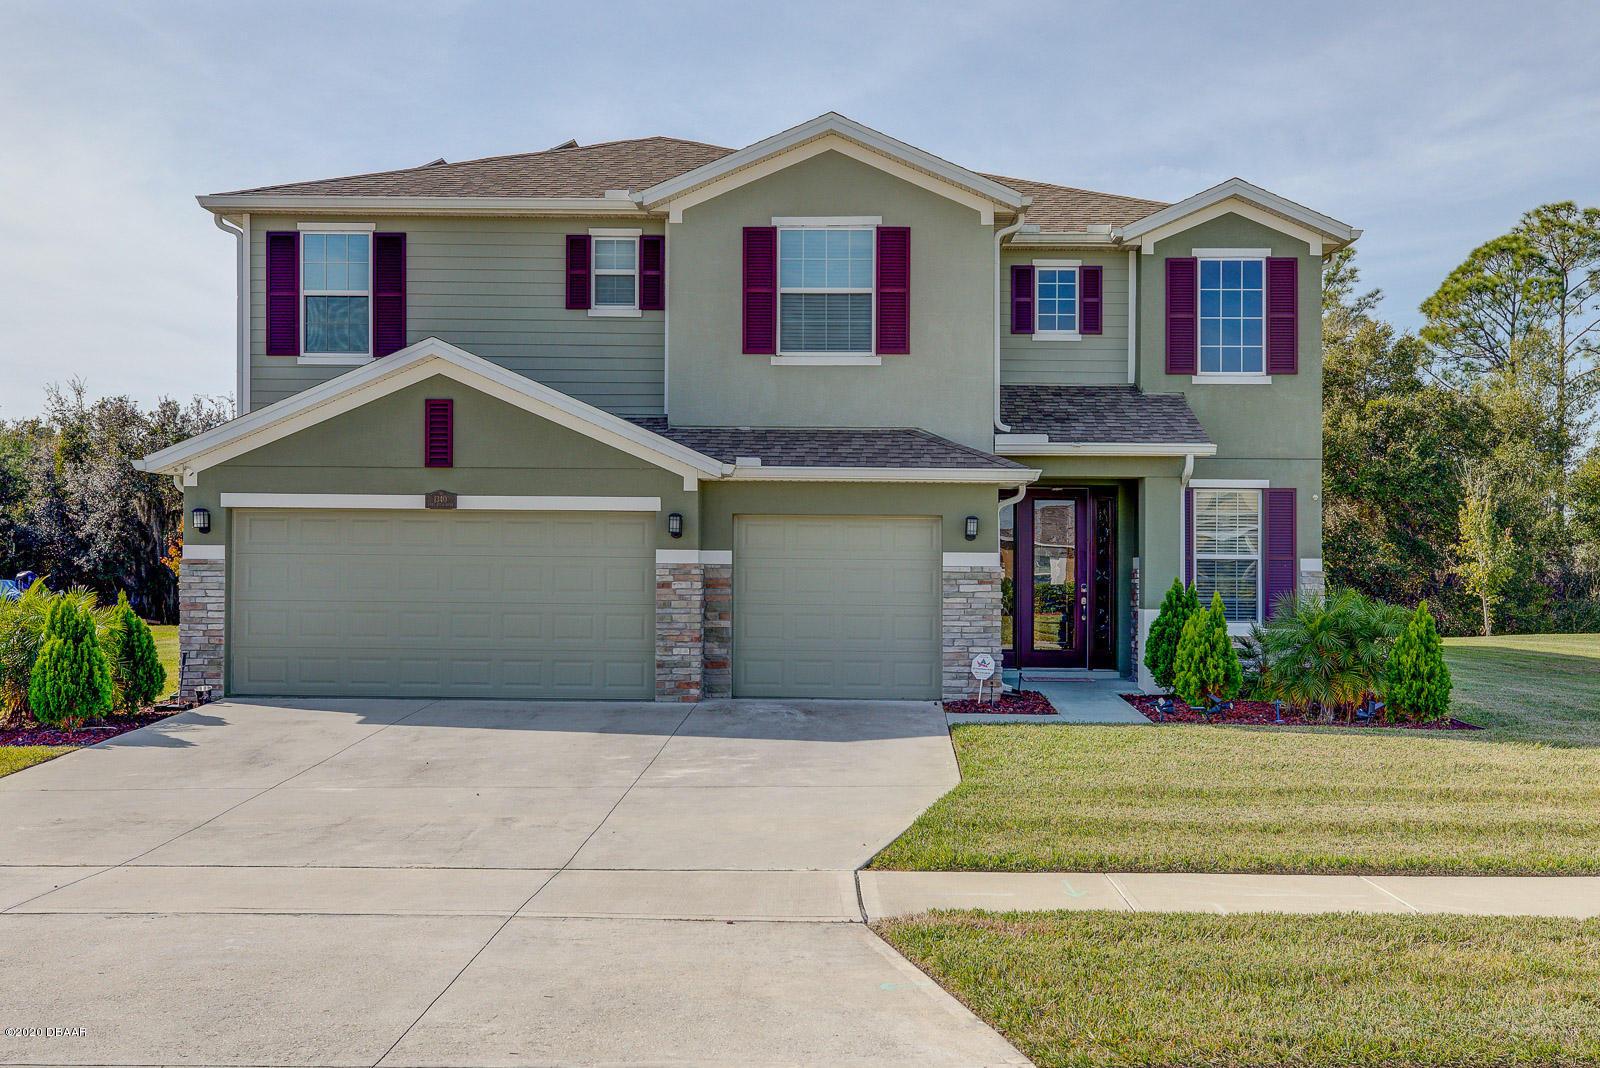 Photo of 1340 Lake Baton Drive, Deltona, FL 32725